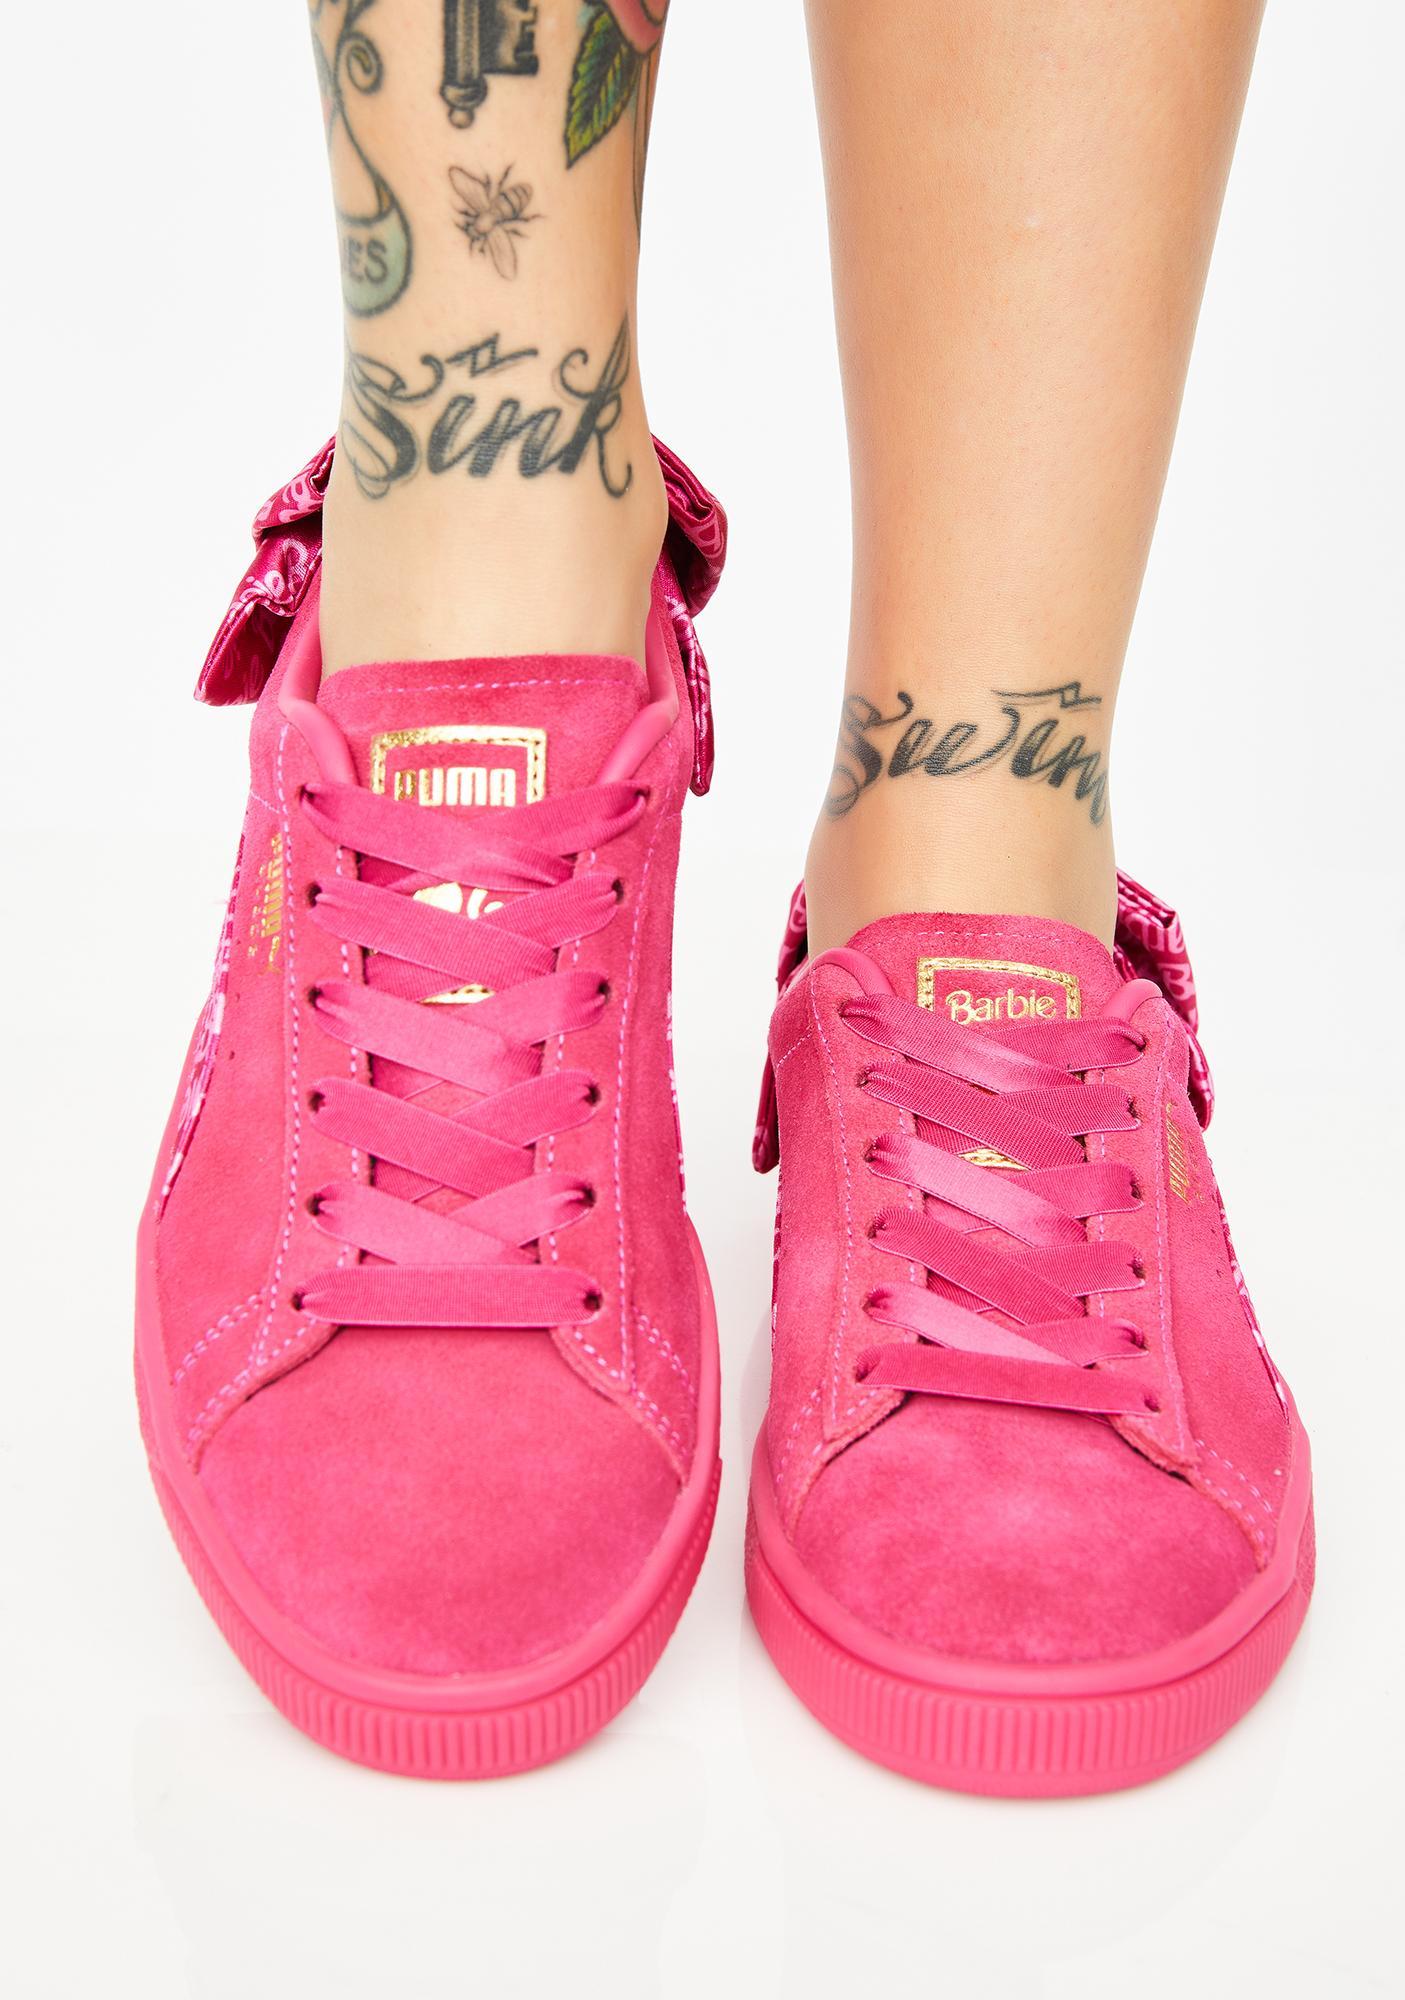 wholesale dealer 53c21 bf058 foot locker nike shox,reebok dmx walking shoes,air max 270 ...